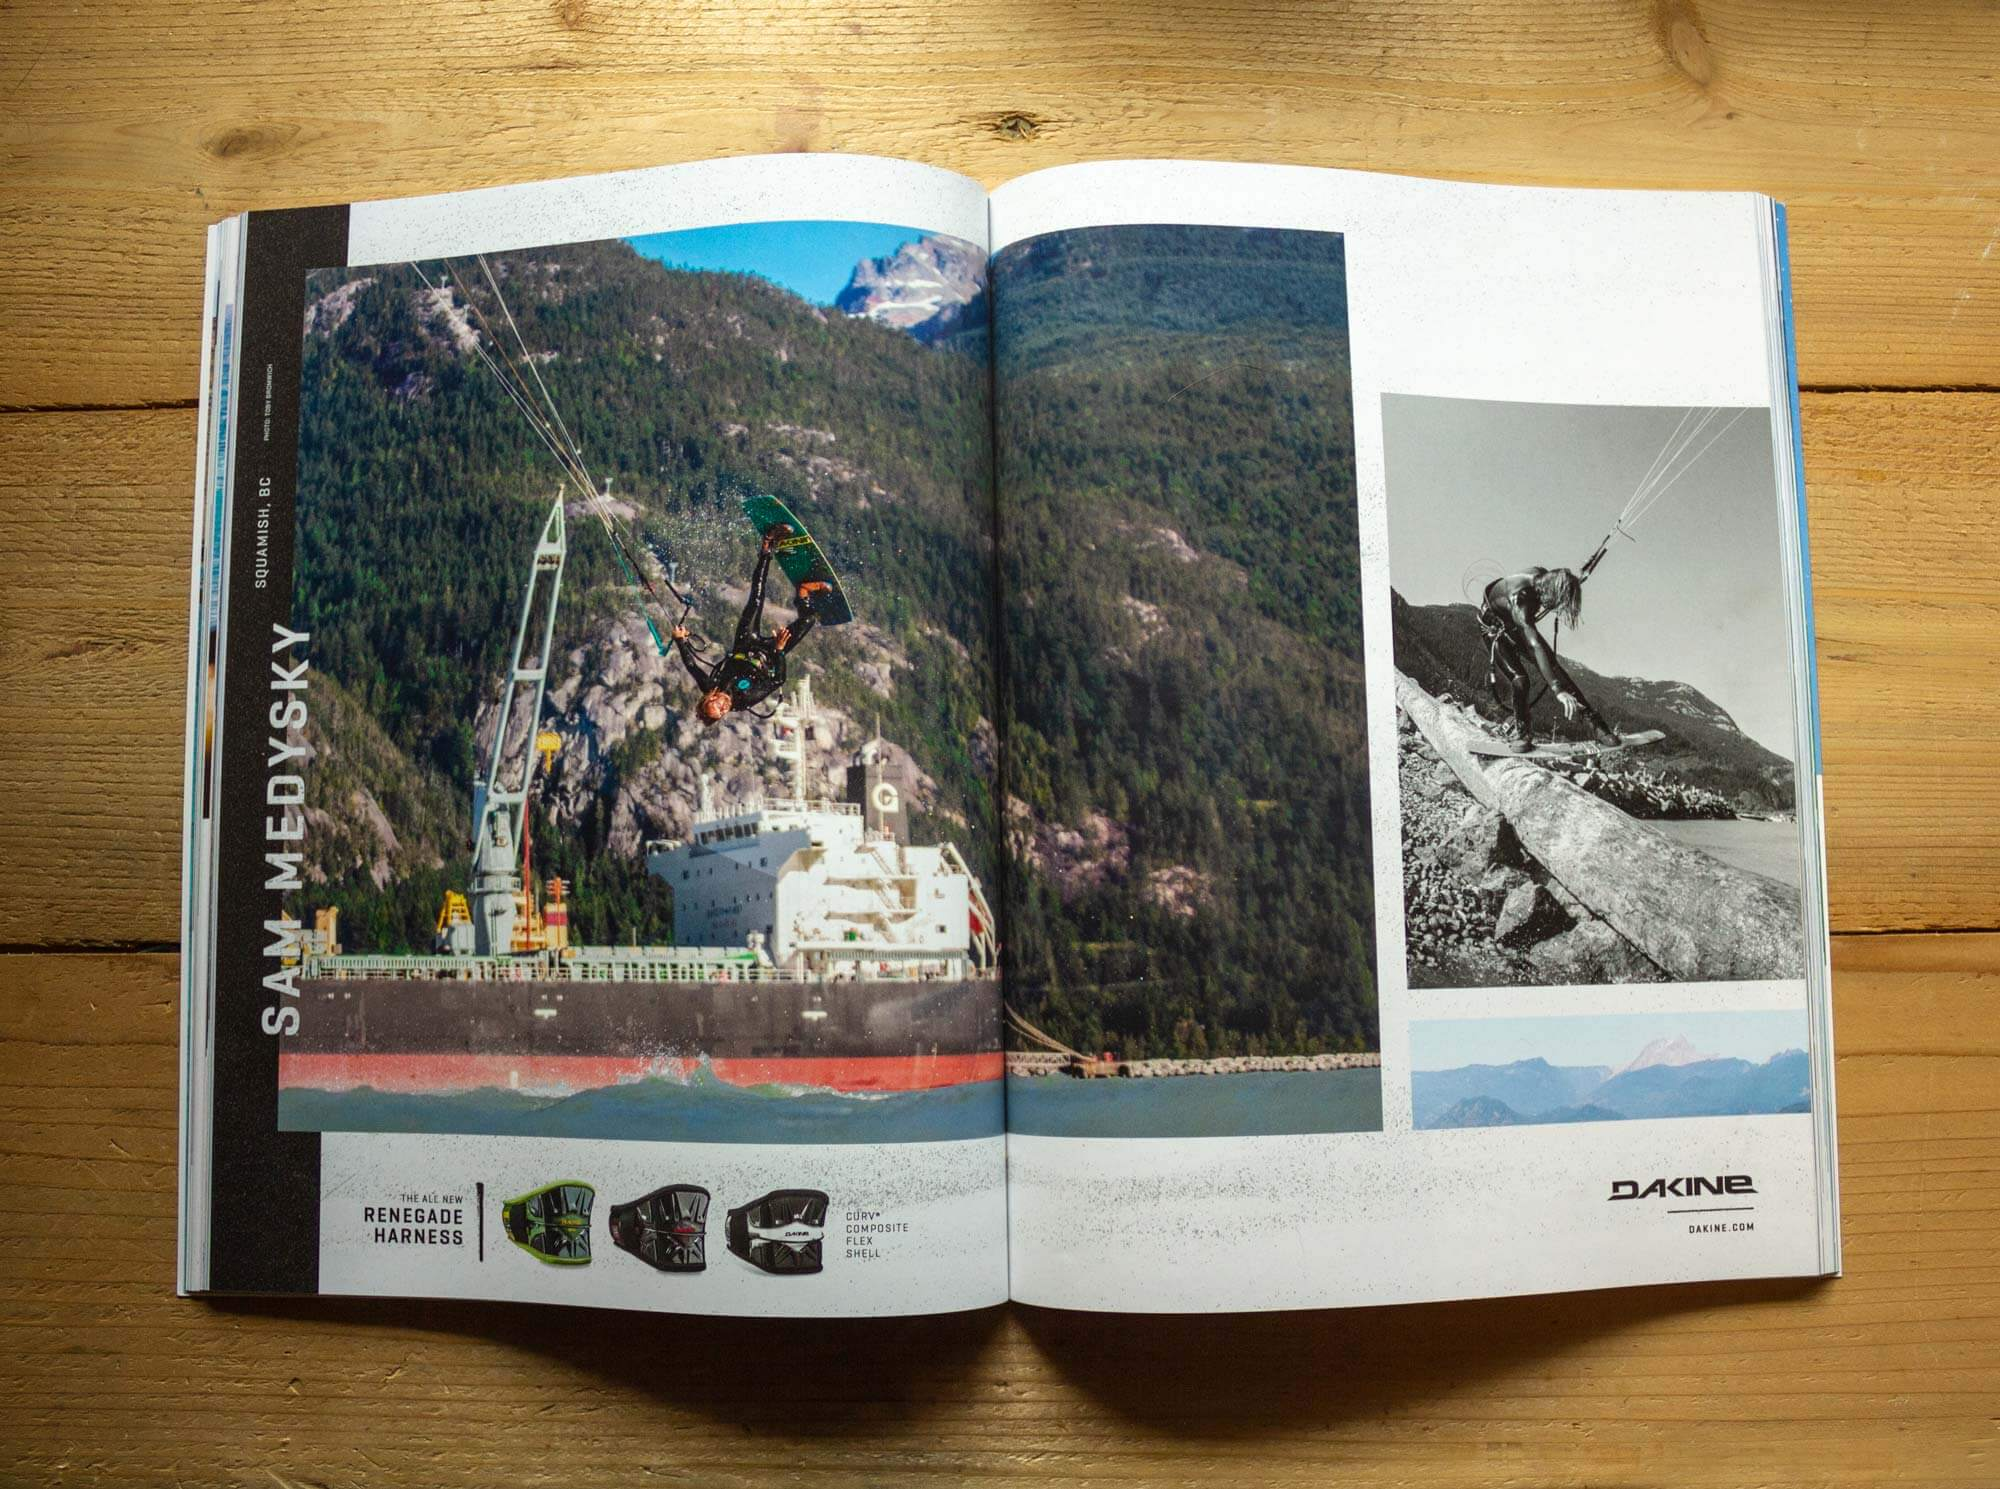 Dakine magazine spread layout design for The Kiteboarder Magazine